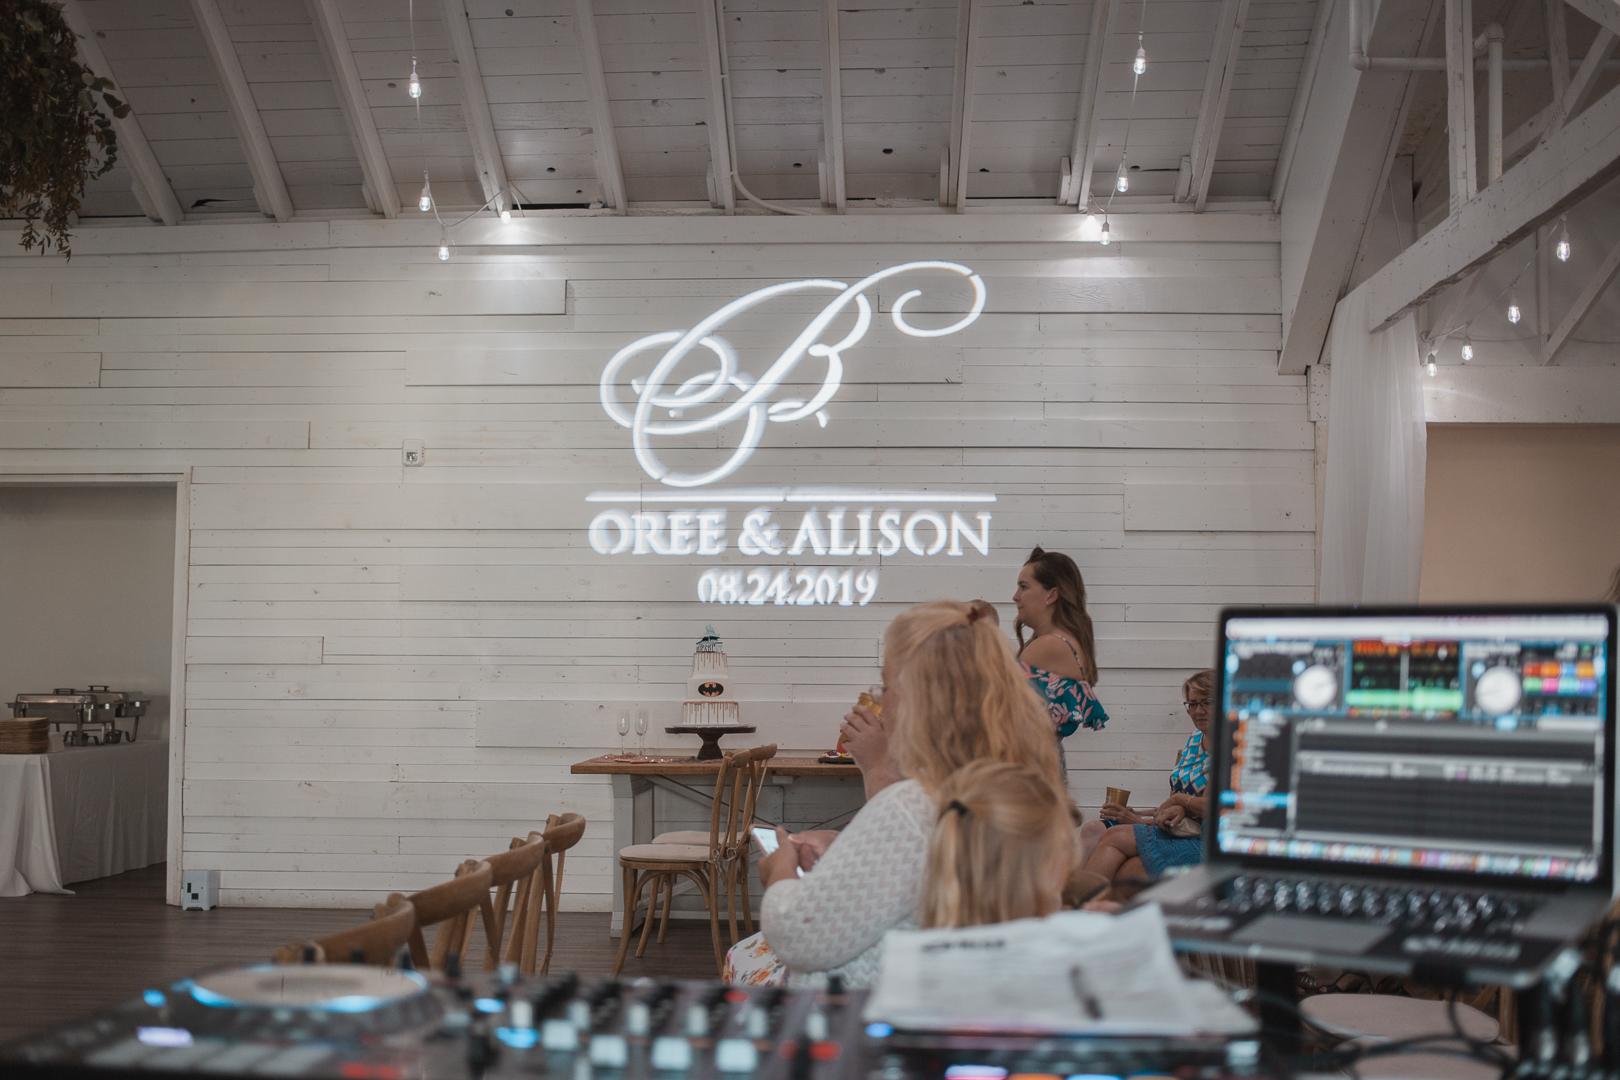 Aloson & Oree's Wedding (8-24-19) Edited5860.jpg